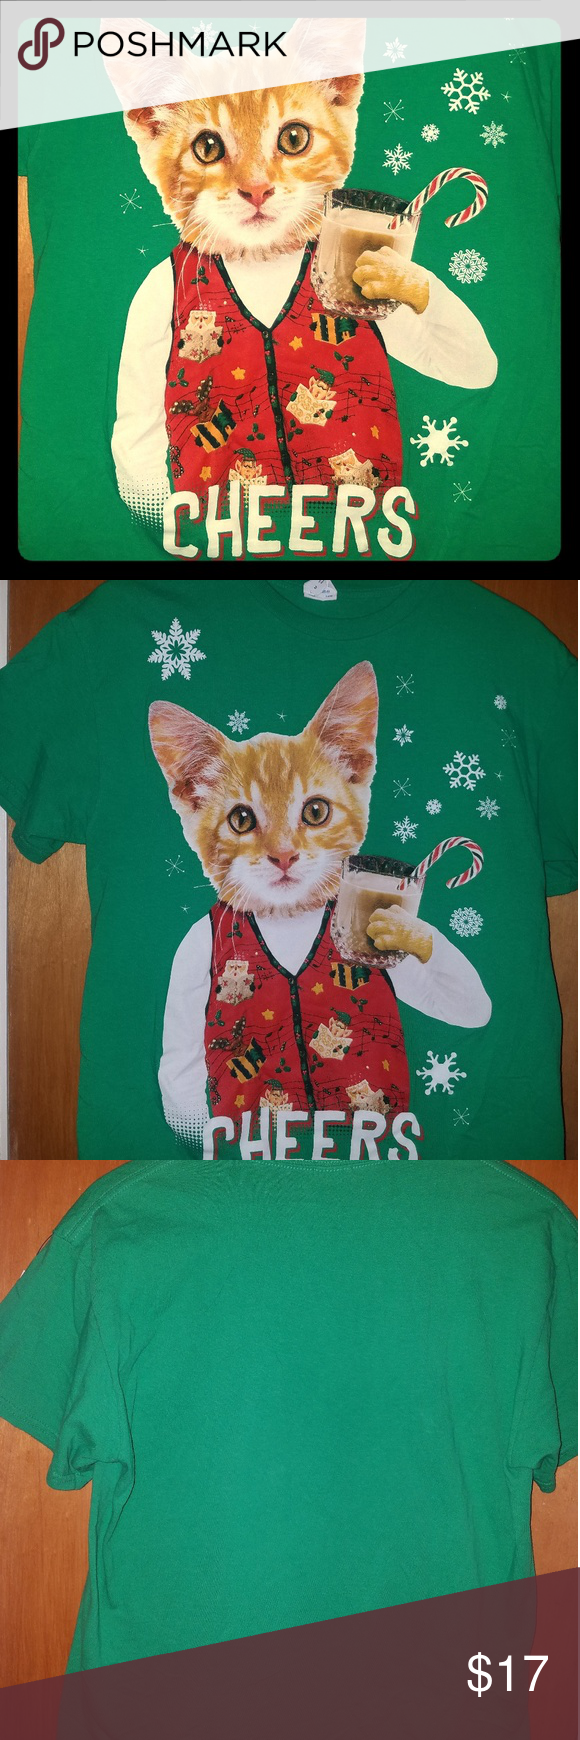 Funny kitten shirt Ugly Christmas Sweater in 2018 | My Posh Picks ...